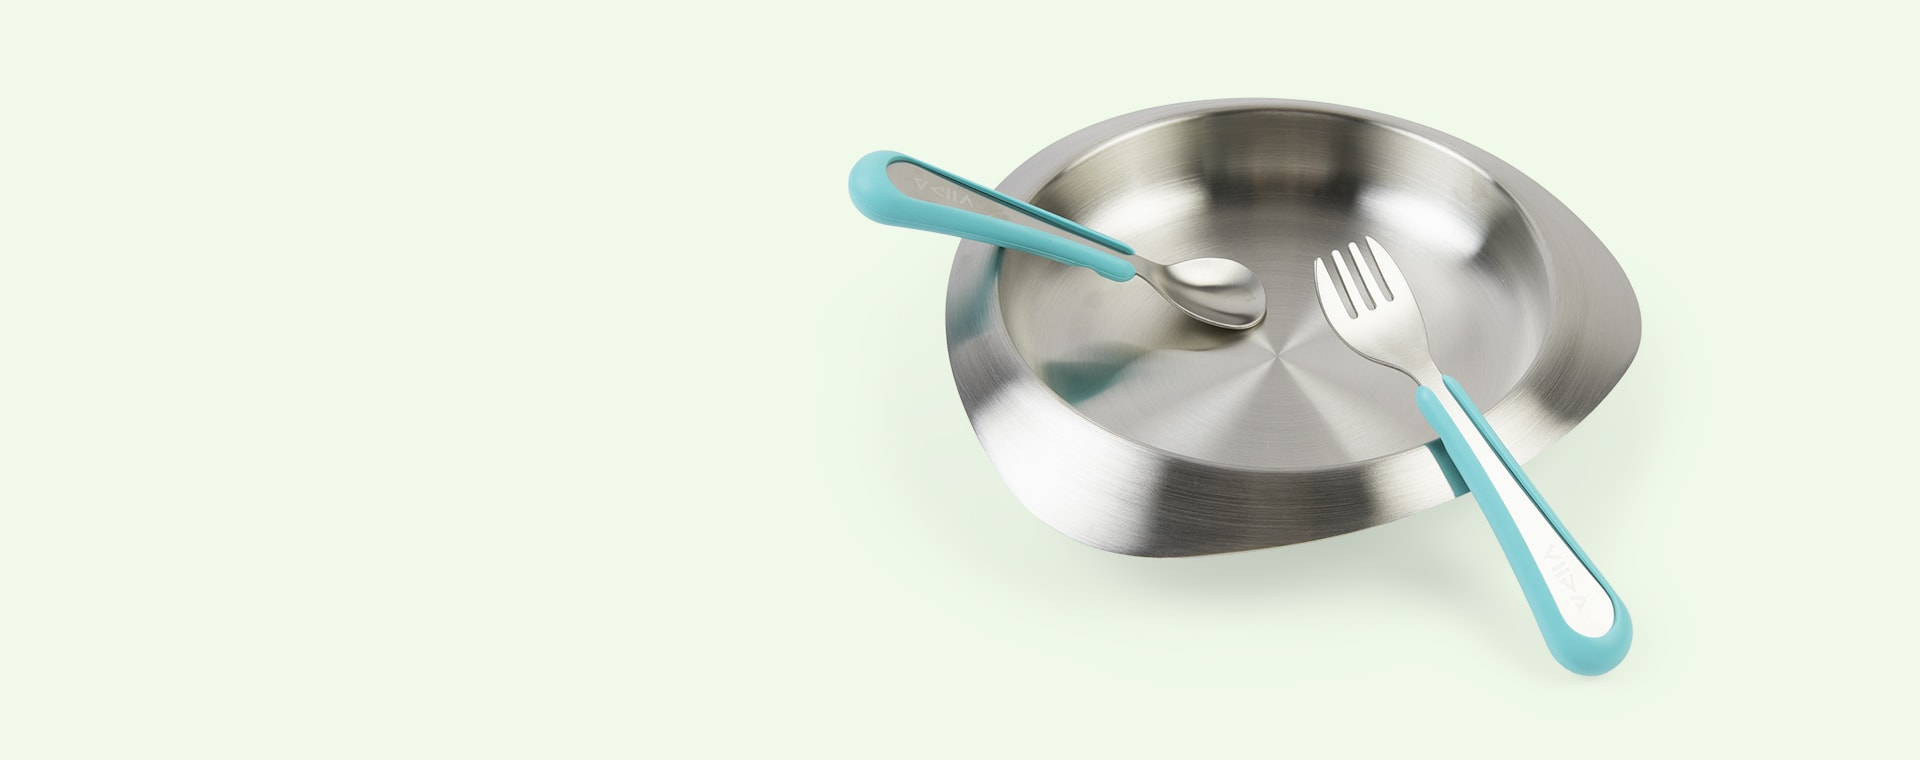 Turquoise Green VIIDA Soufflé Antibacterial Stainless Steel Fork & Spoon Set